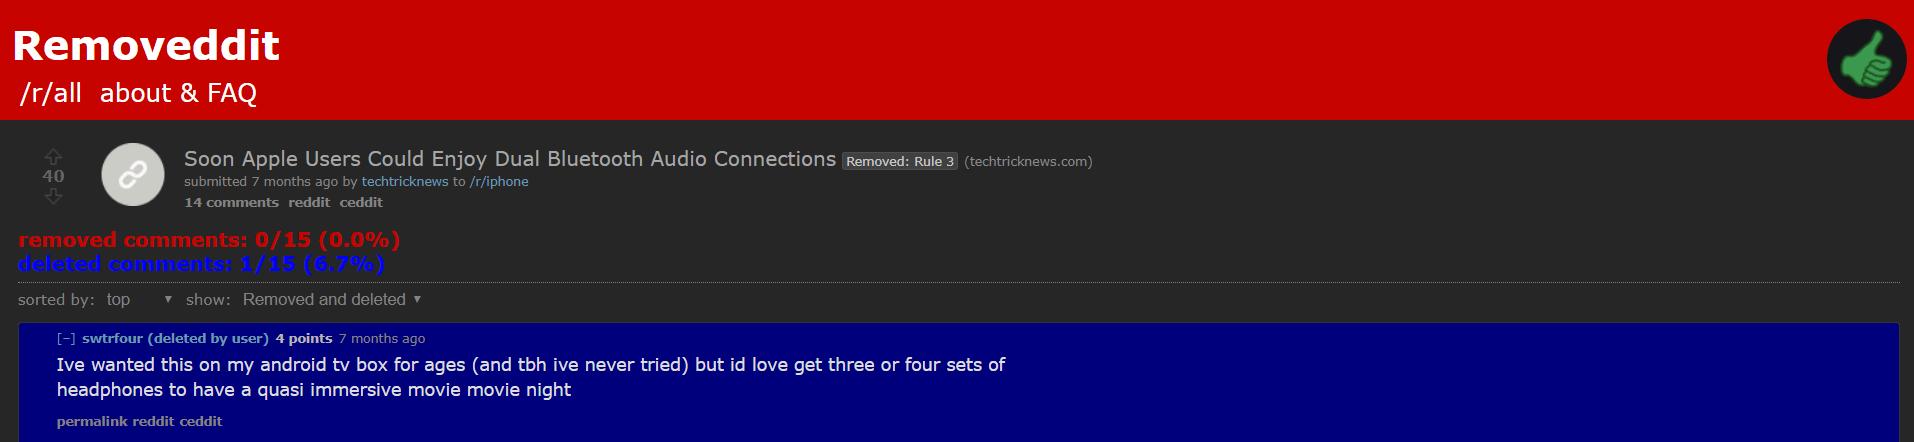 Removeddit Post